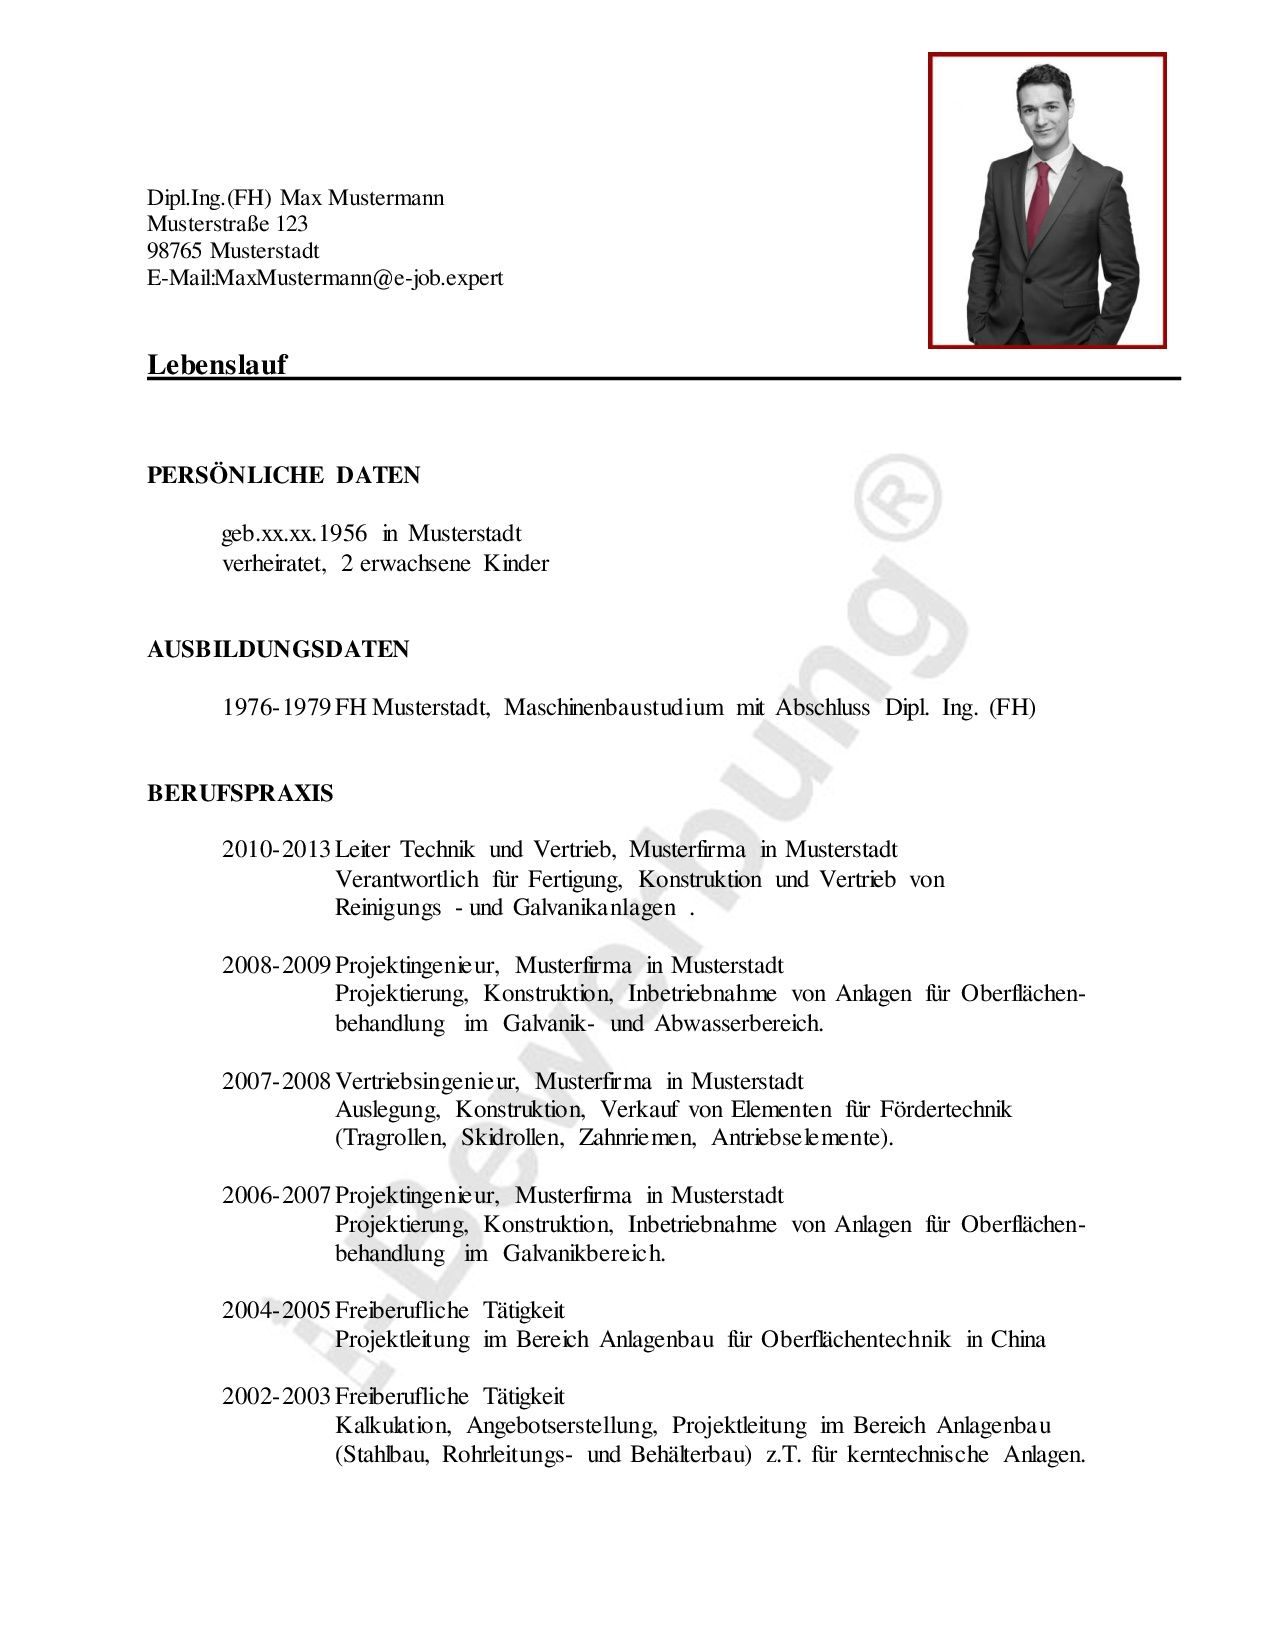 Berühmt Projektleiter Lebenslauf Pdf Ideen - Entry Level Resume ...